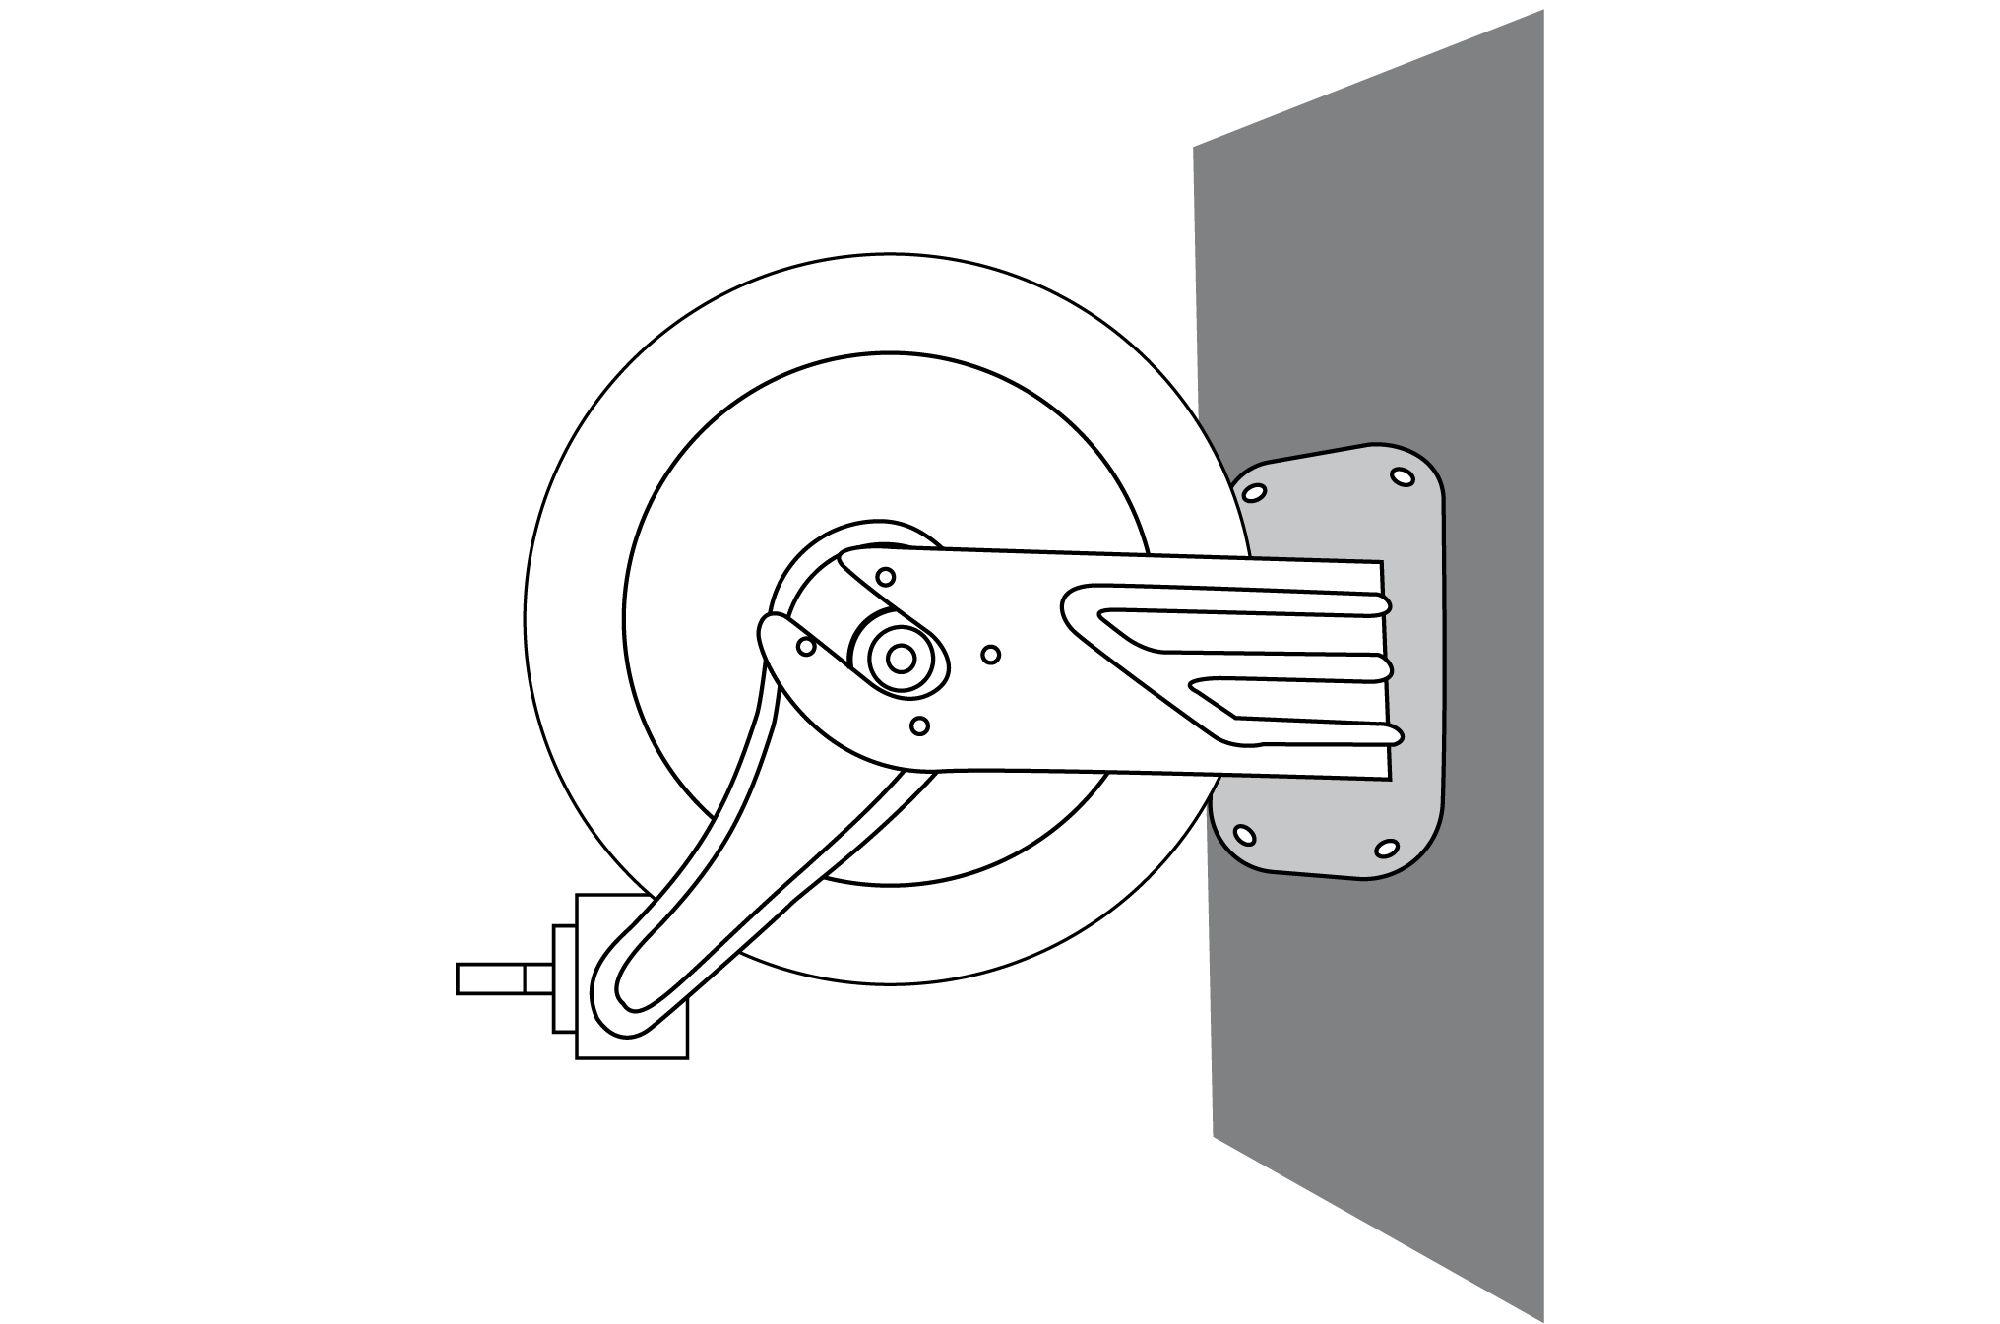 Shd1015 Airhose Reels Mechanical Workshop Equipment Vynckier Tools Technics Sa 300 Wiring Diagram Installation On The Wall